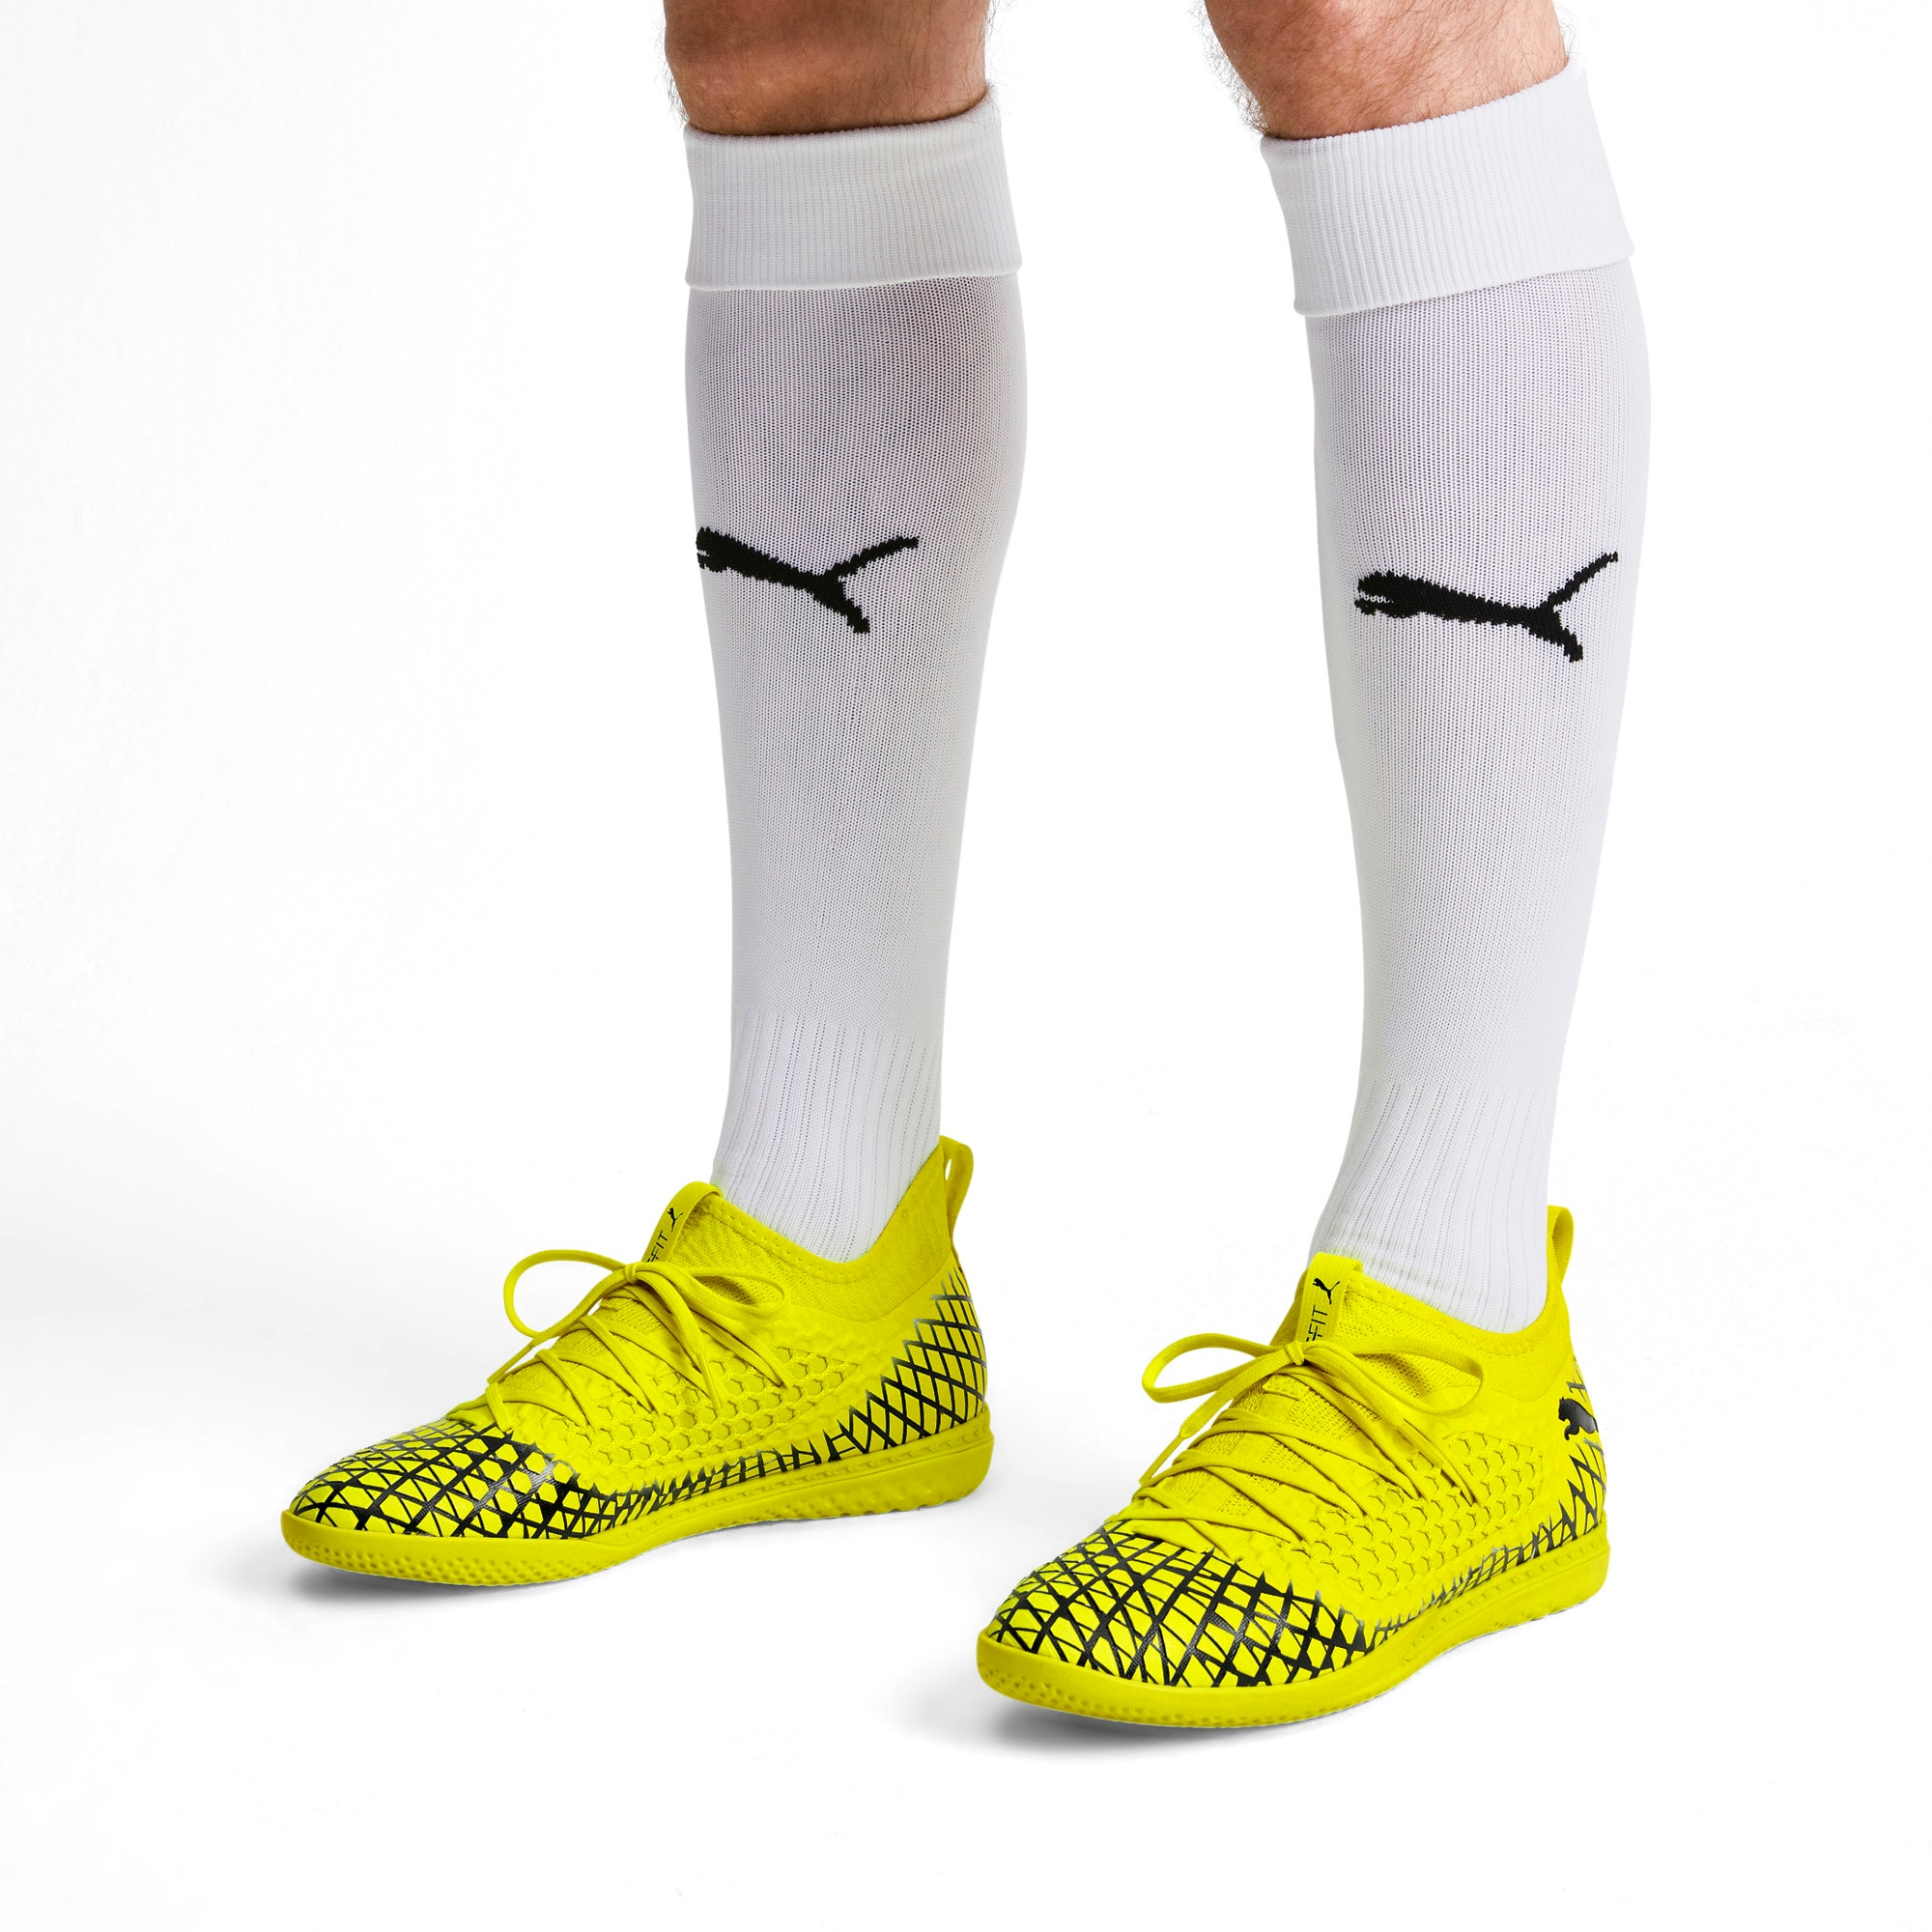 Thumbnail 2 of FUTURE 4.3 NETFIT IT Men's Soccer Shoes, Yellow Alert-Puma Black, medium